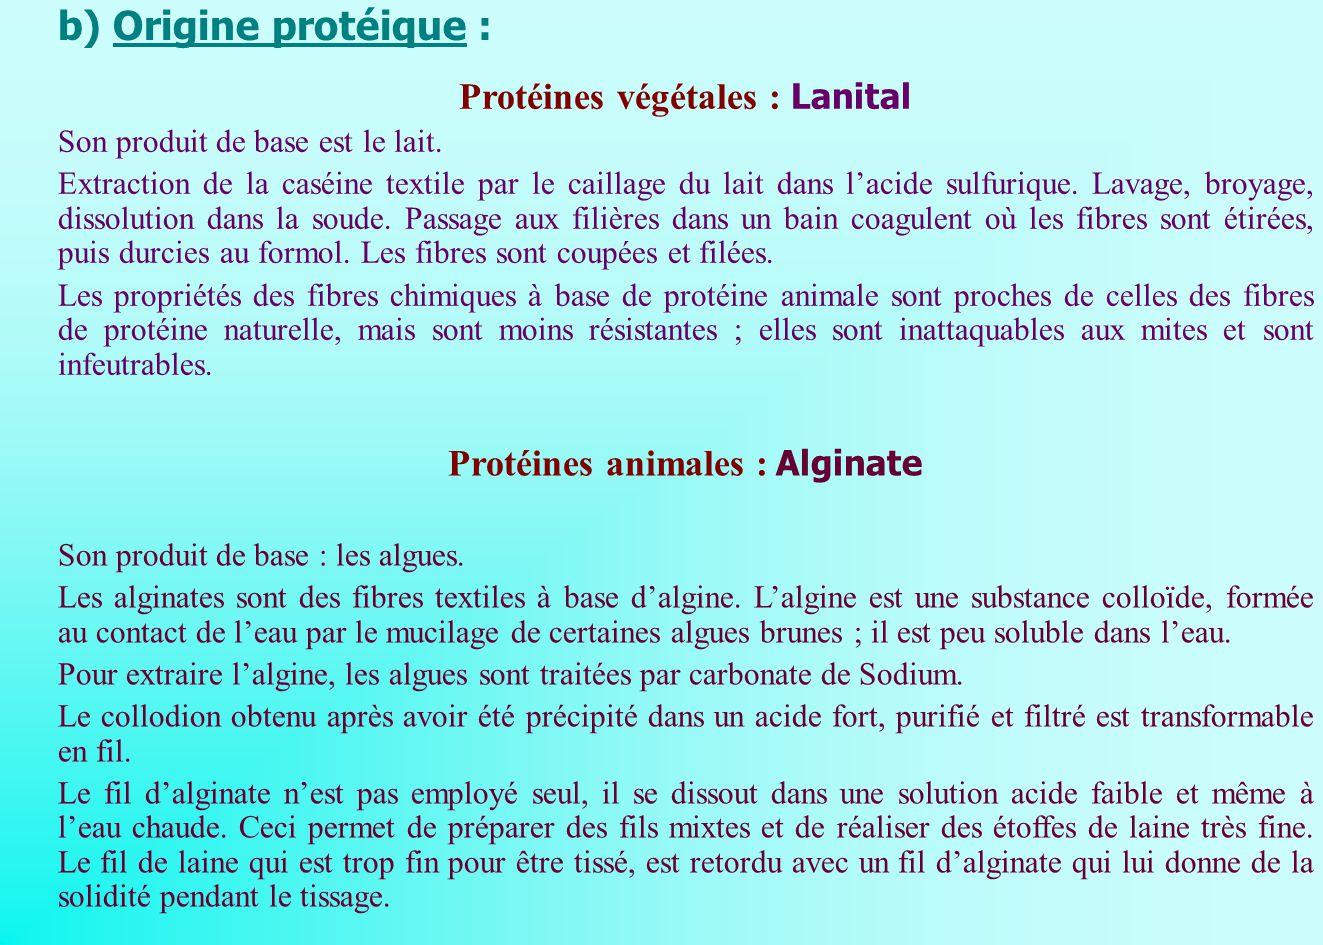 Protéines végétales : Lanital Protéines animales : Alginate